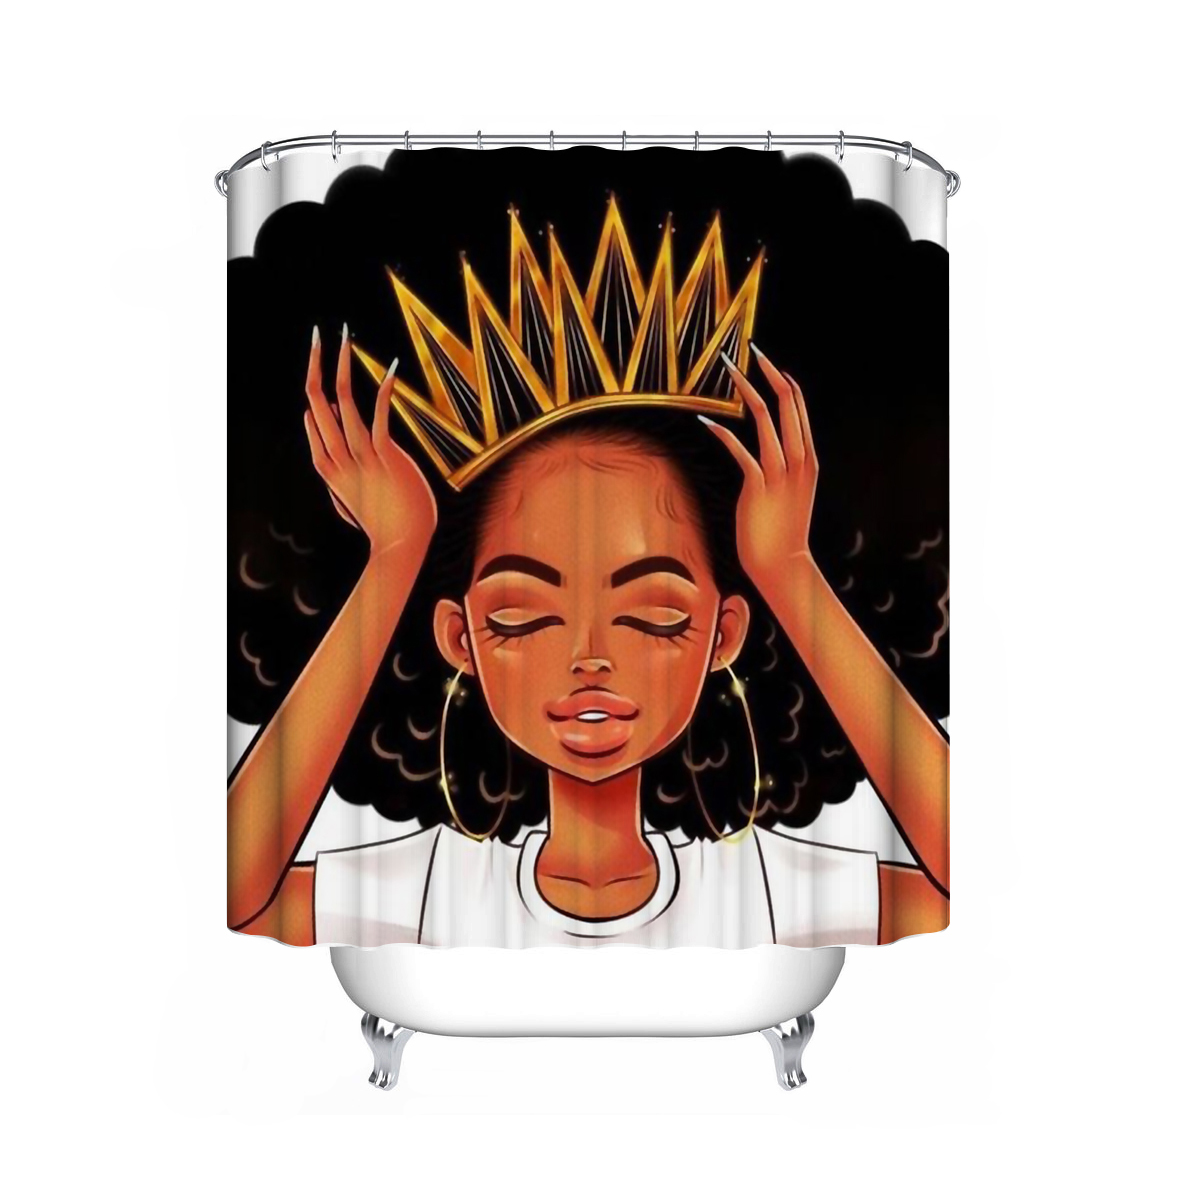 crown art print african american queen shower curtain or pedestal rug lid toilet cover bath mat doormat set for home kitchen decor for black women